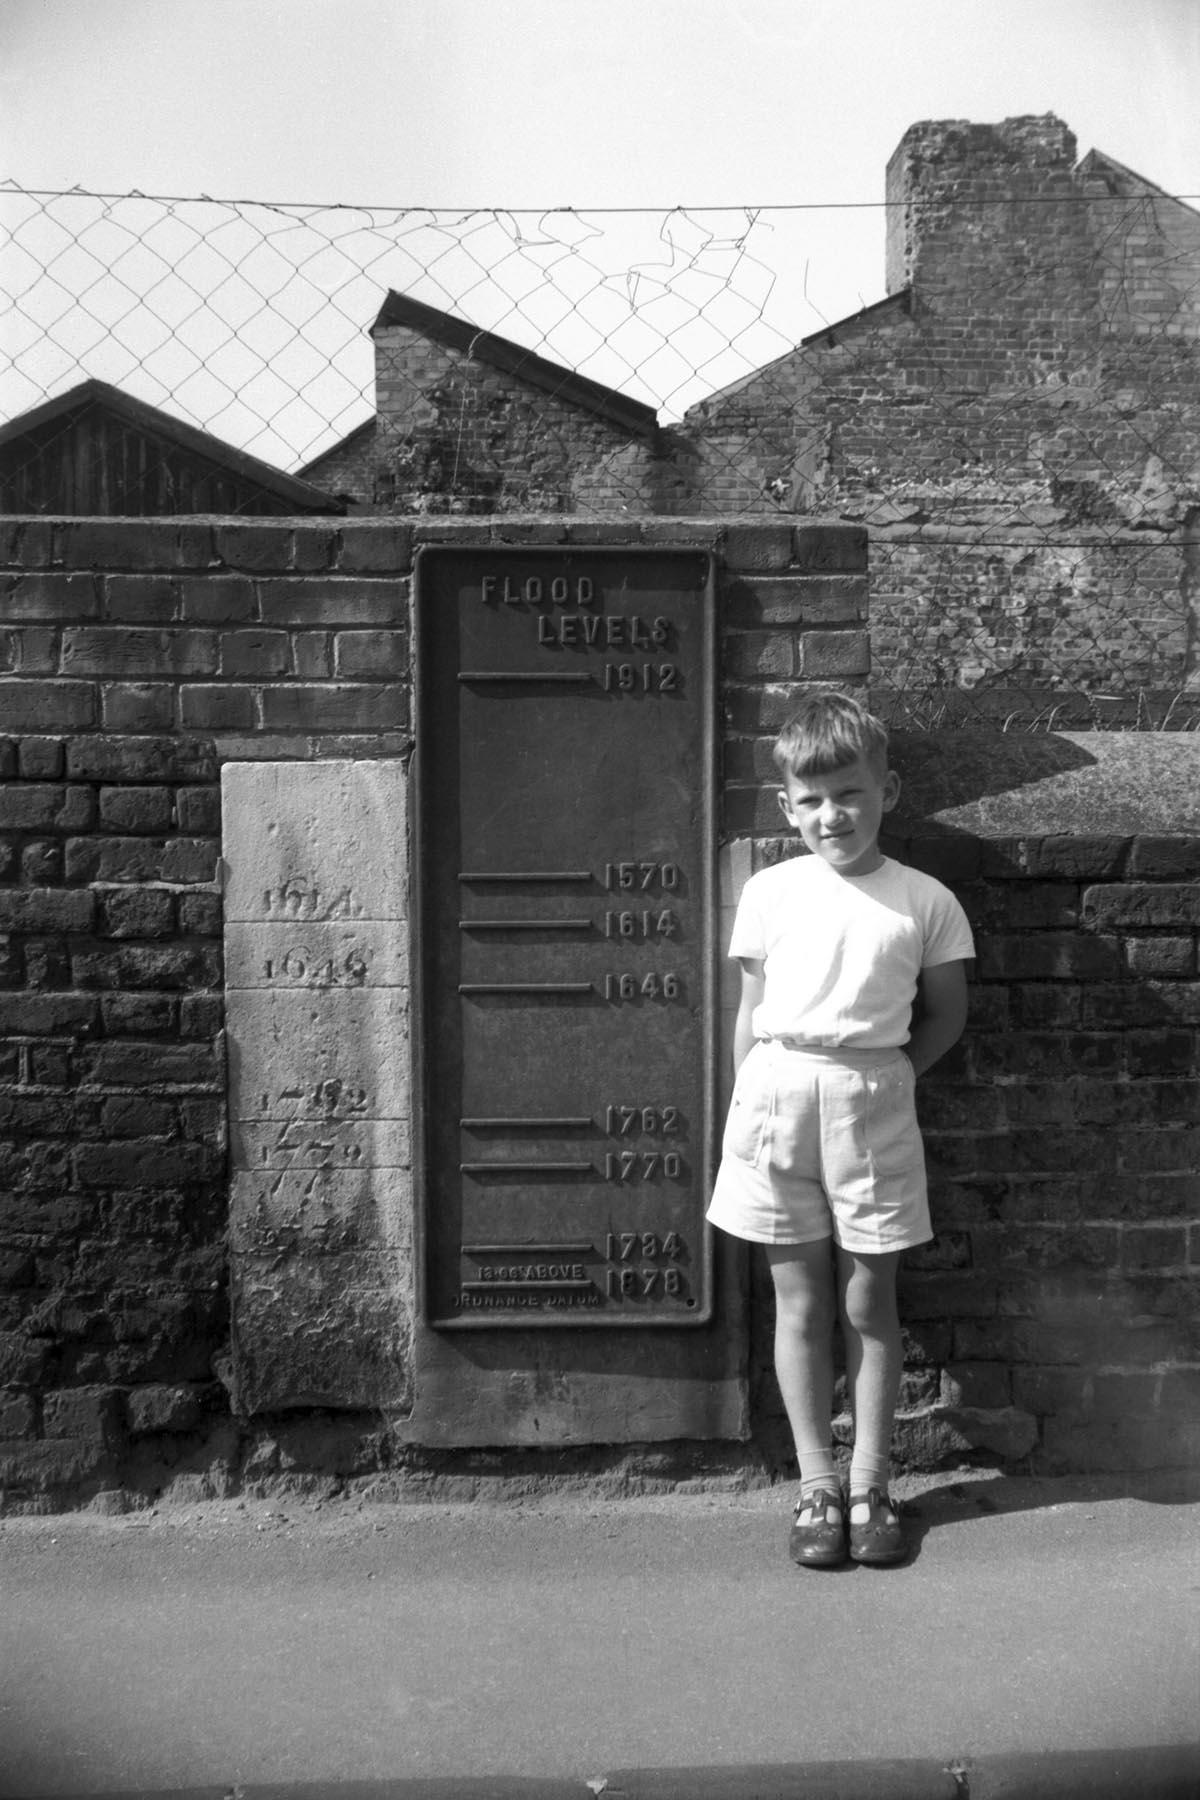 Flood level gauges New Mills Yard [4640] 1961-08-27